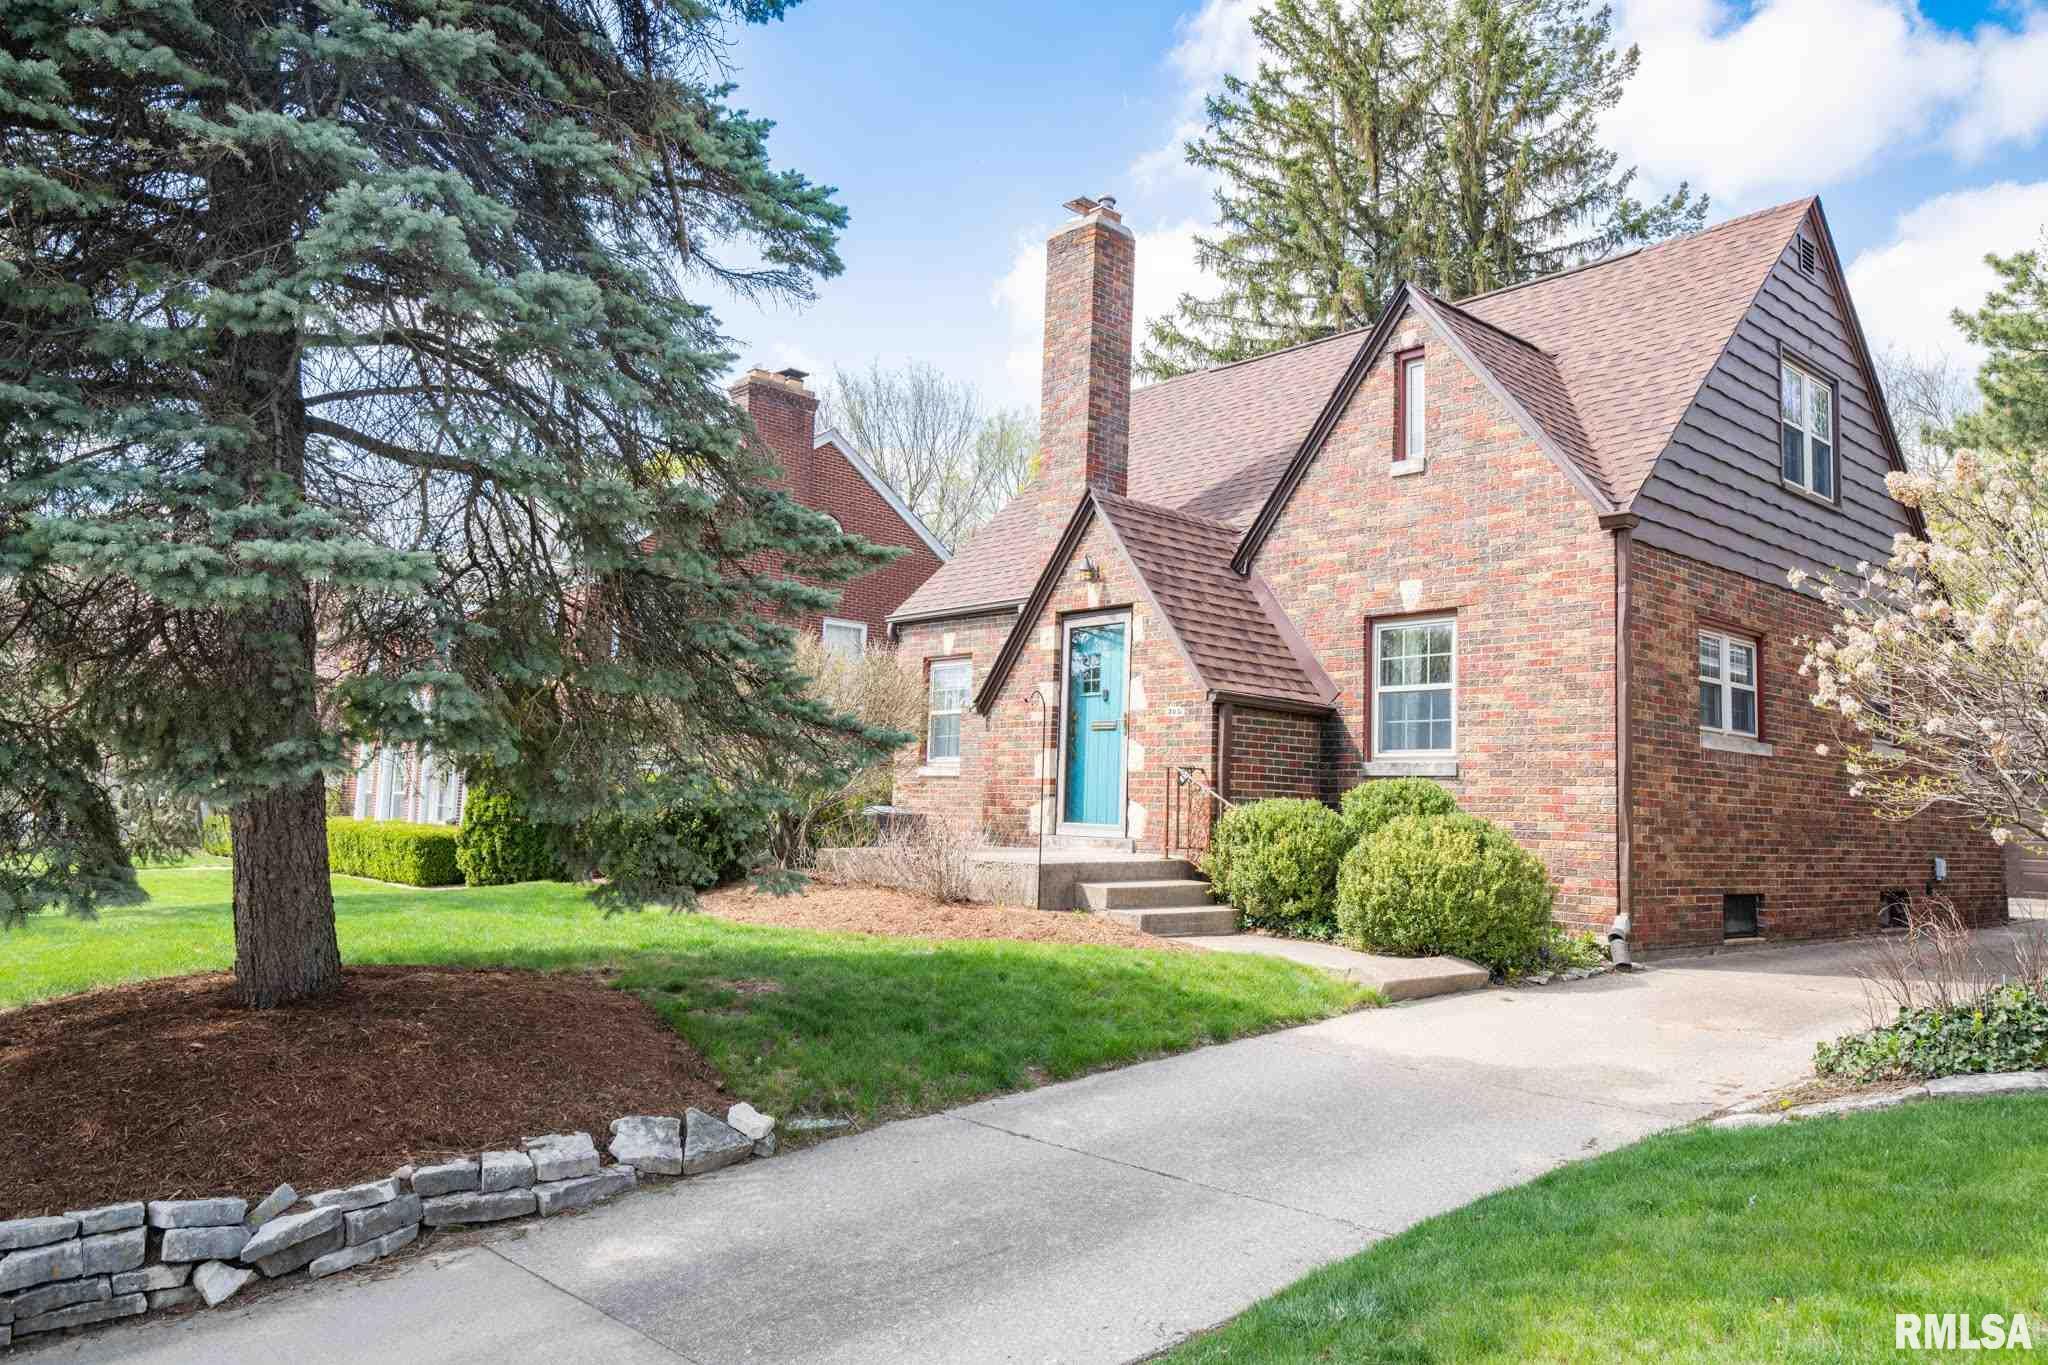 305 W MELBOURNE Property Photo - Peoria, IL real estate listing